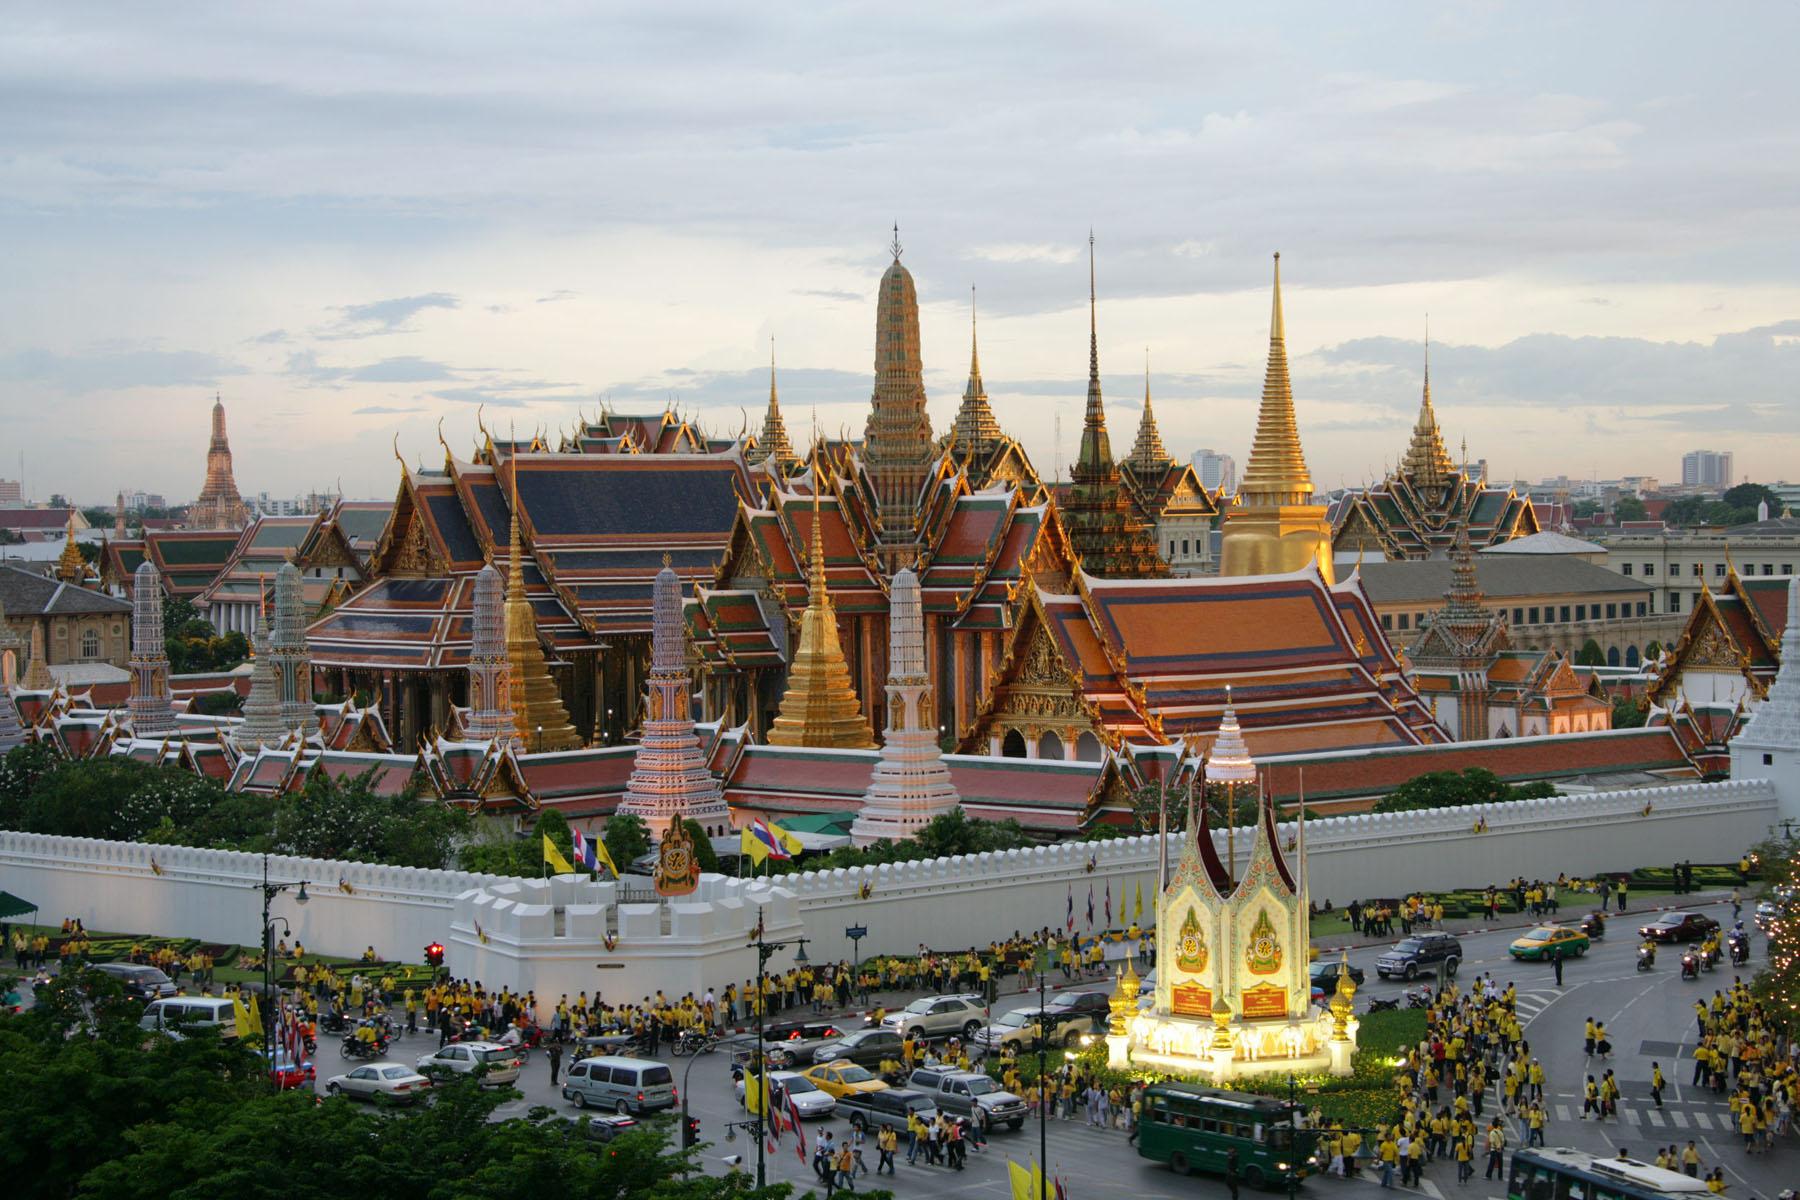 تور بانکوک – پاتایا ( ویژه نوروز ۹۷ )